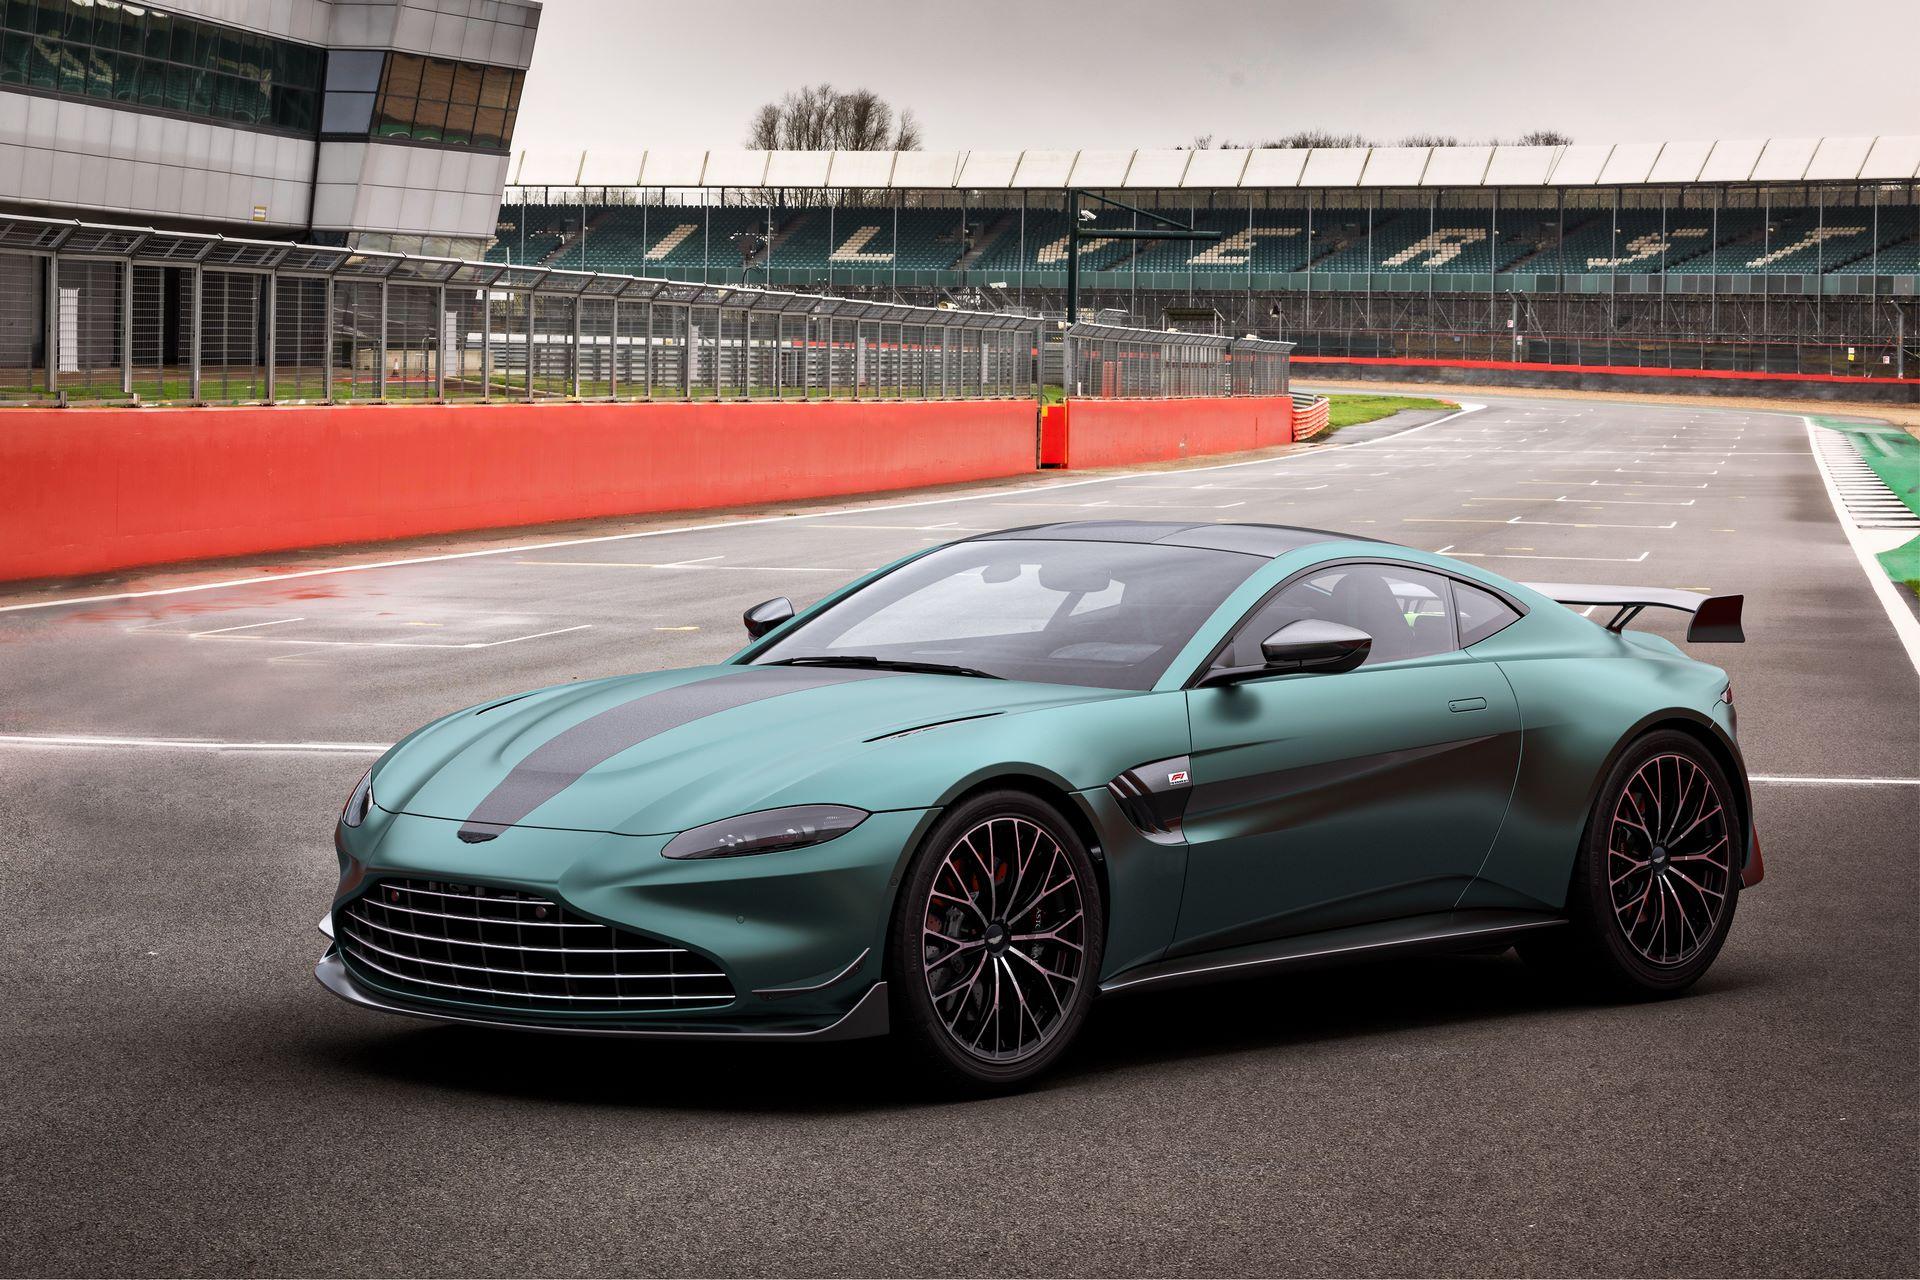 Aston-Martin-Vantage-F1-Edition-3